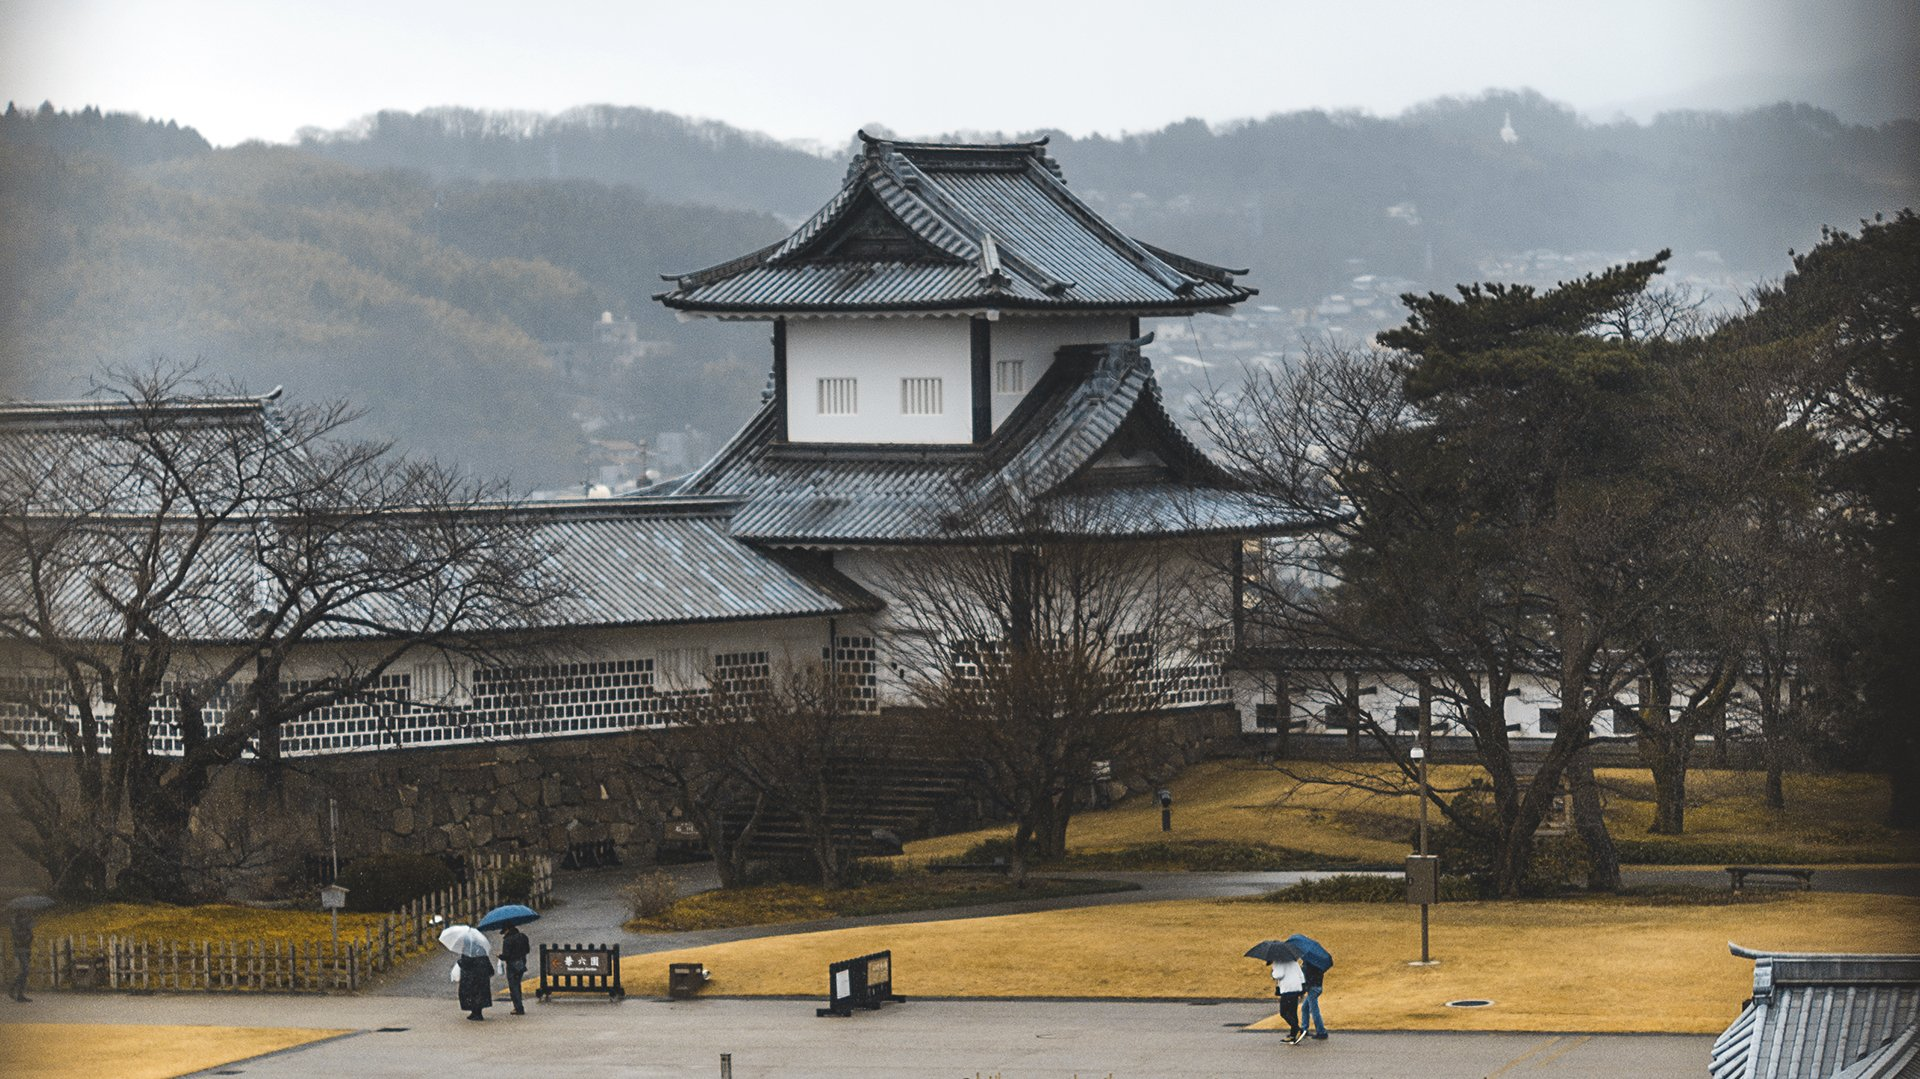 dónde está Kanazawa en Japón | rojocangrejo.com